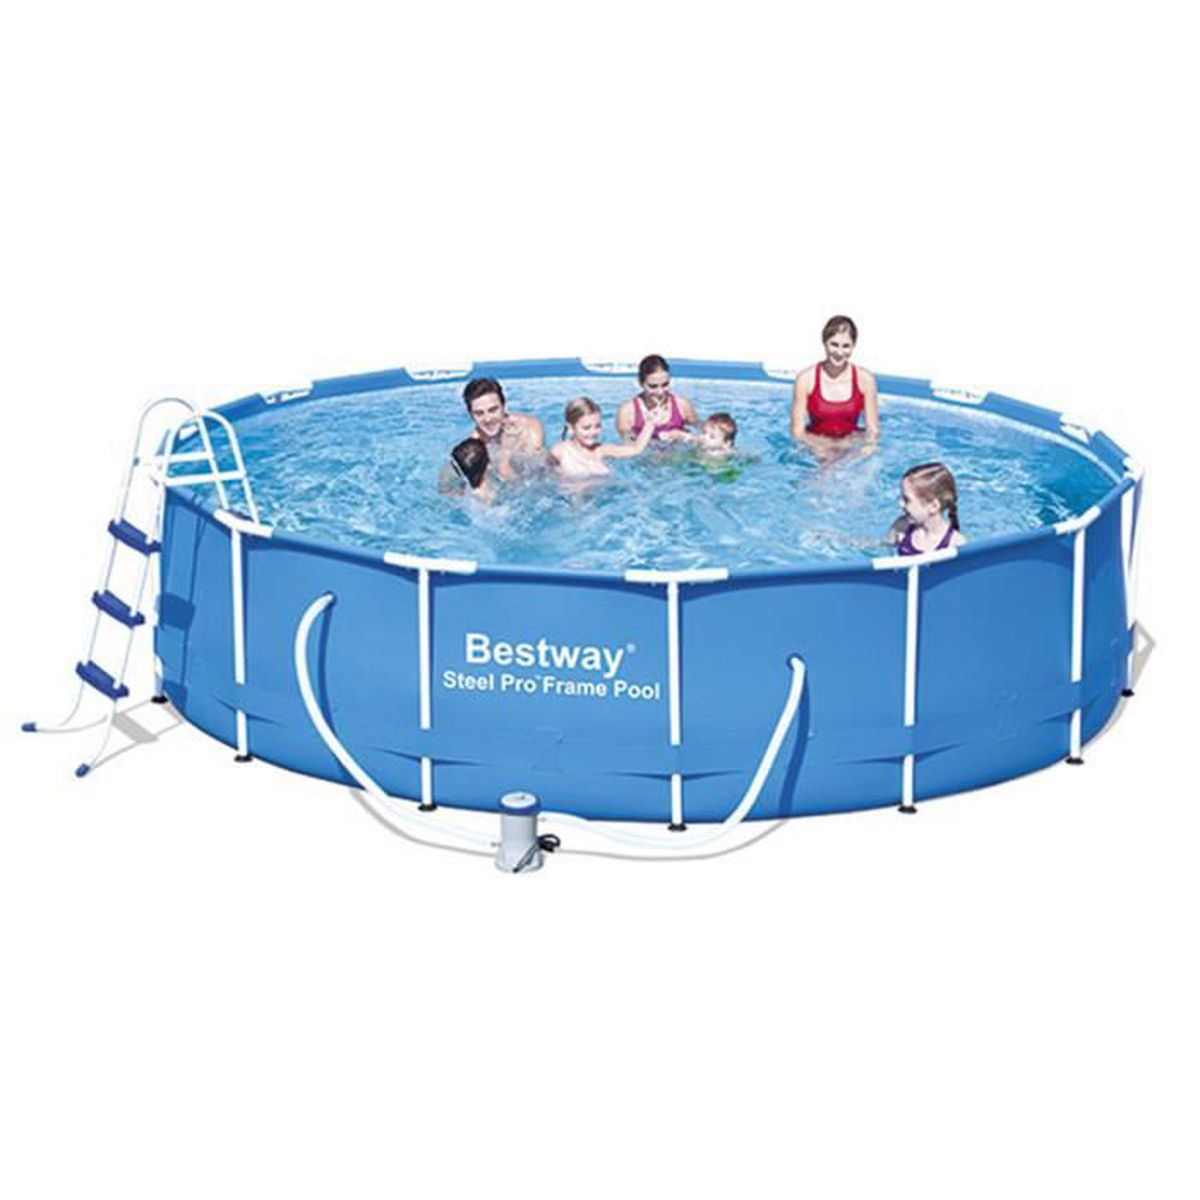 piscine tubulaire amovible bestway steel pro 305x100 cm